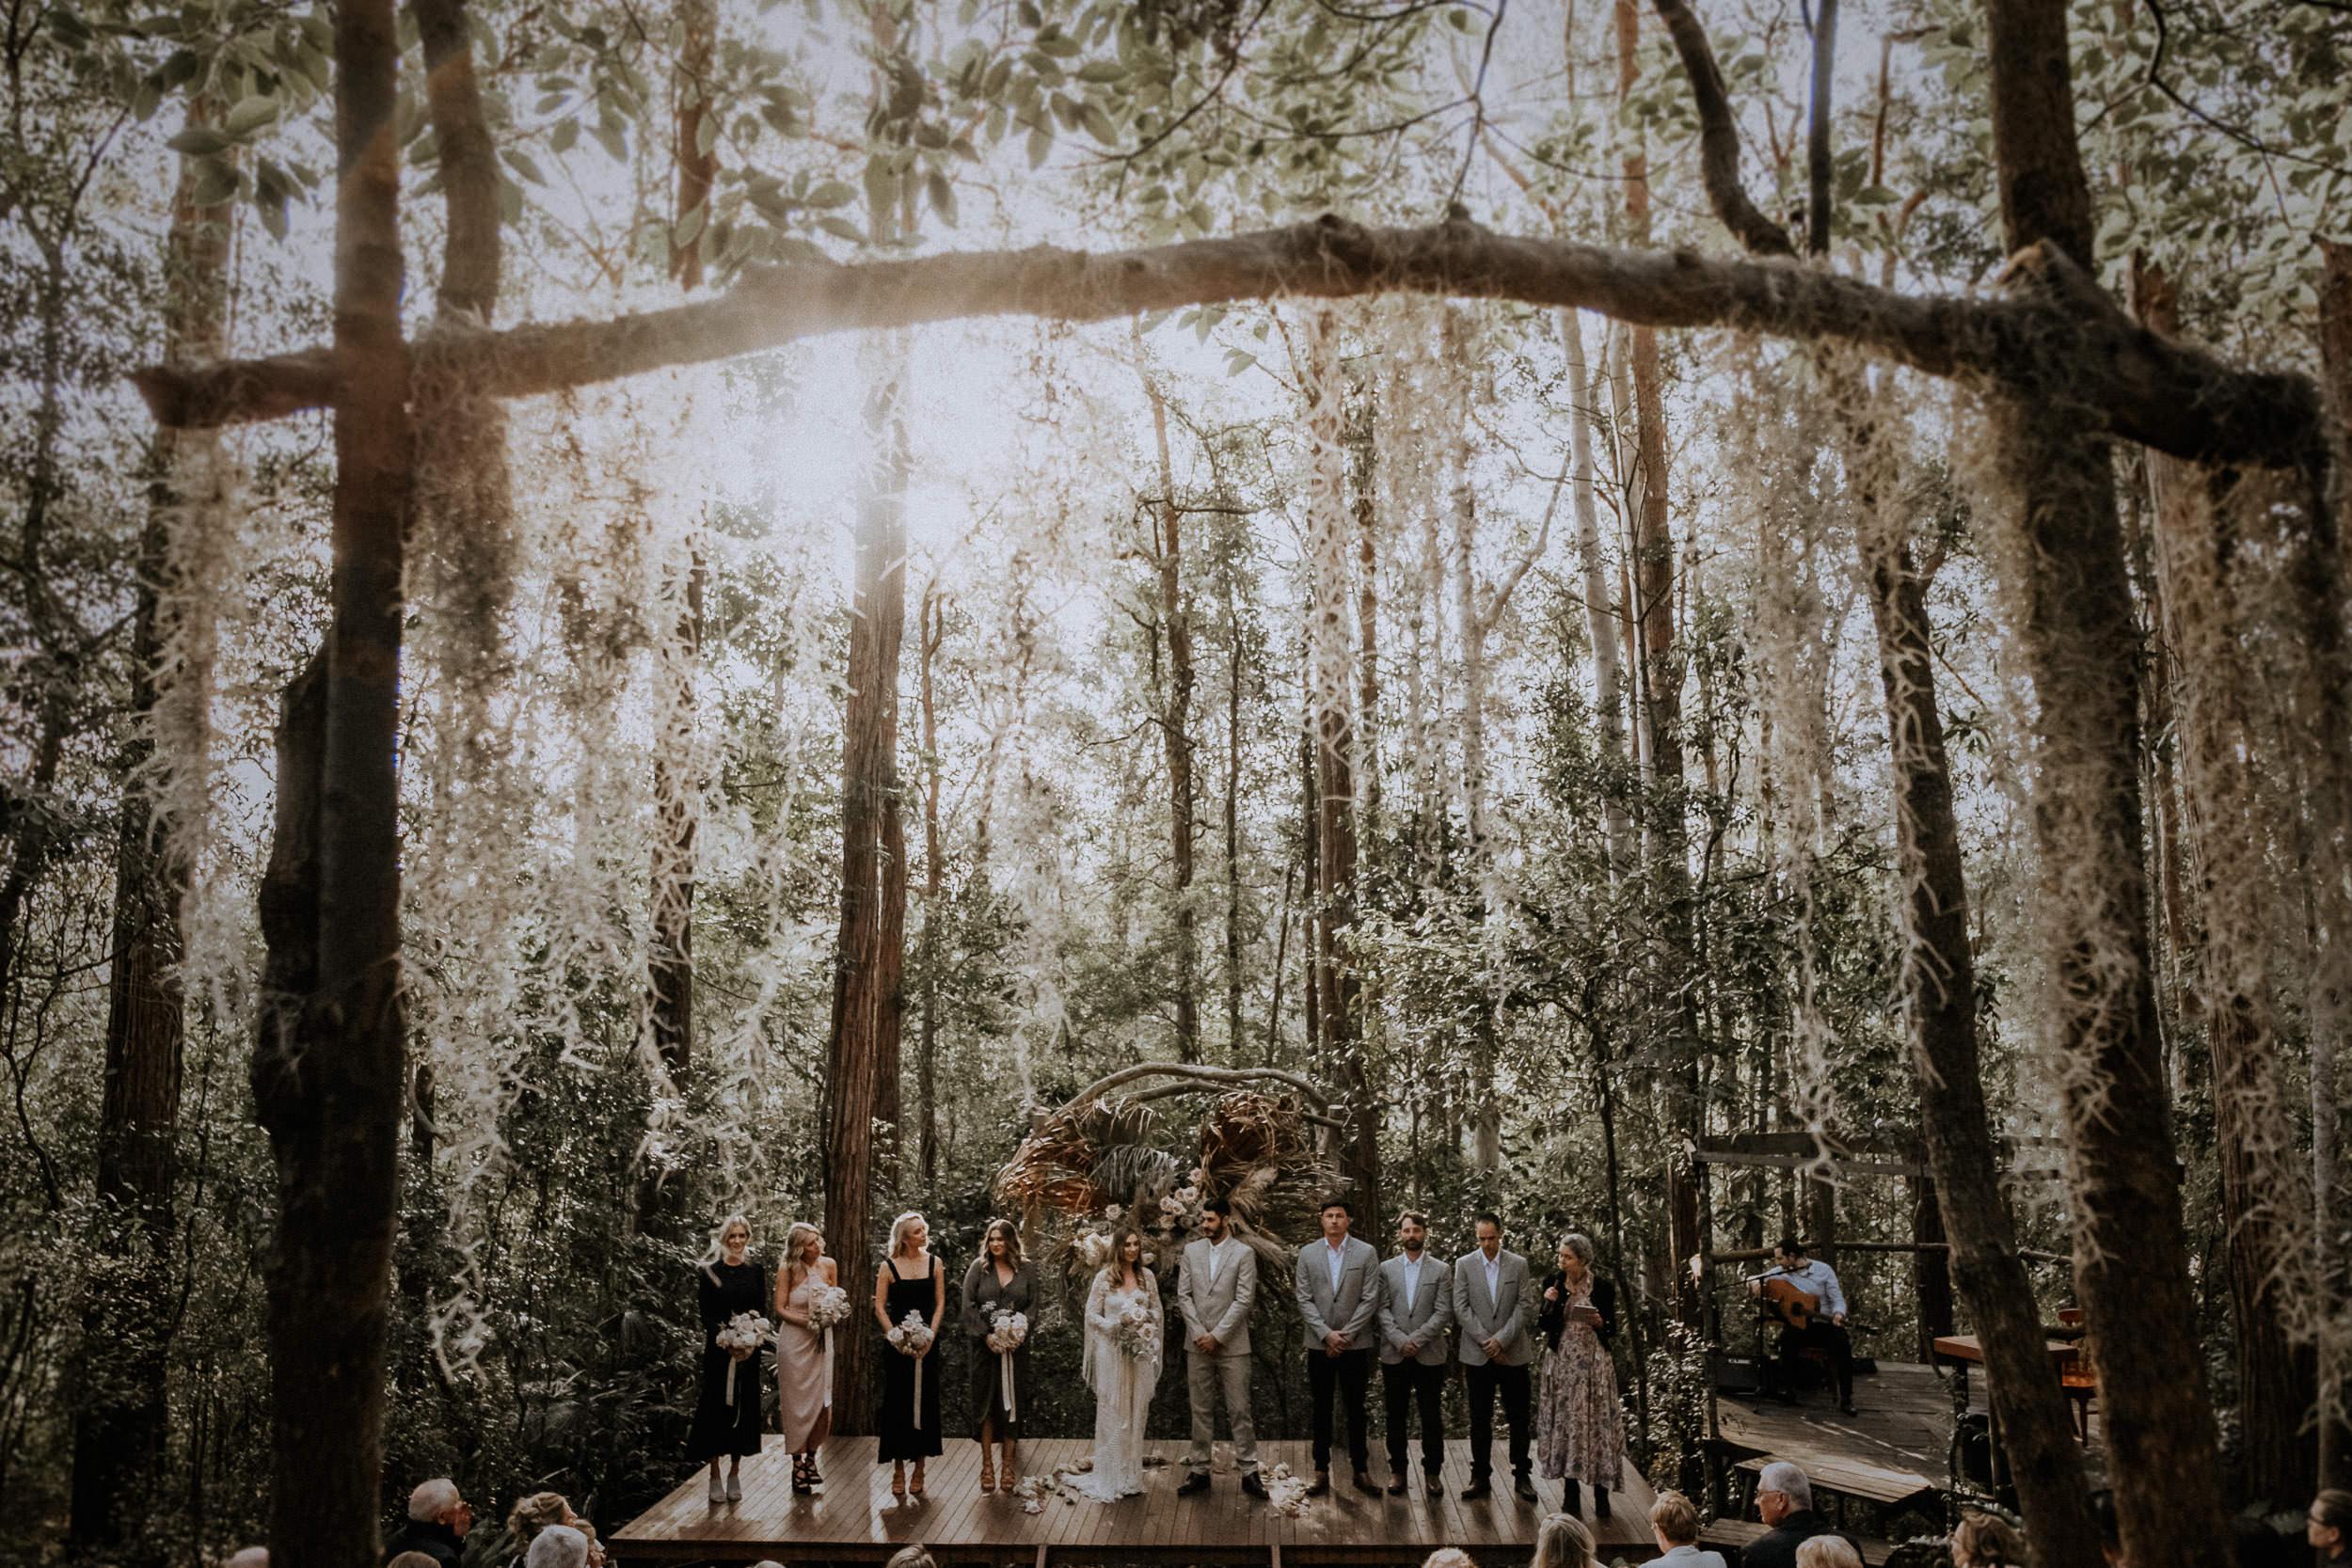 S&A Elopement - Kings & Thieves - Shred 'Til Dead - Central Coast Beach Forest Wedding - 178.jpg